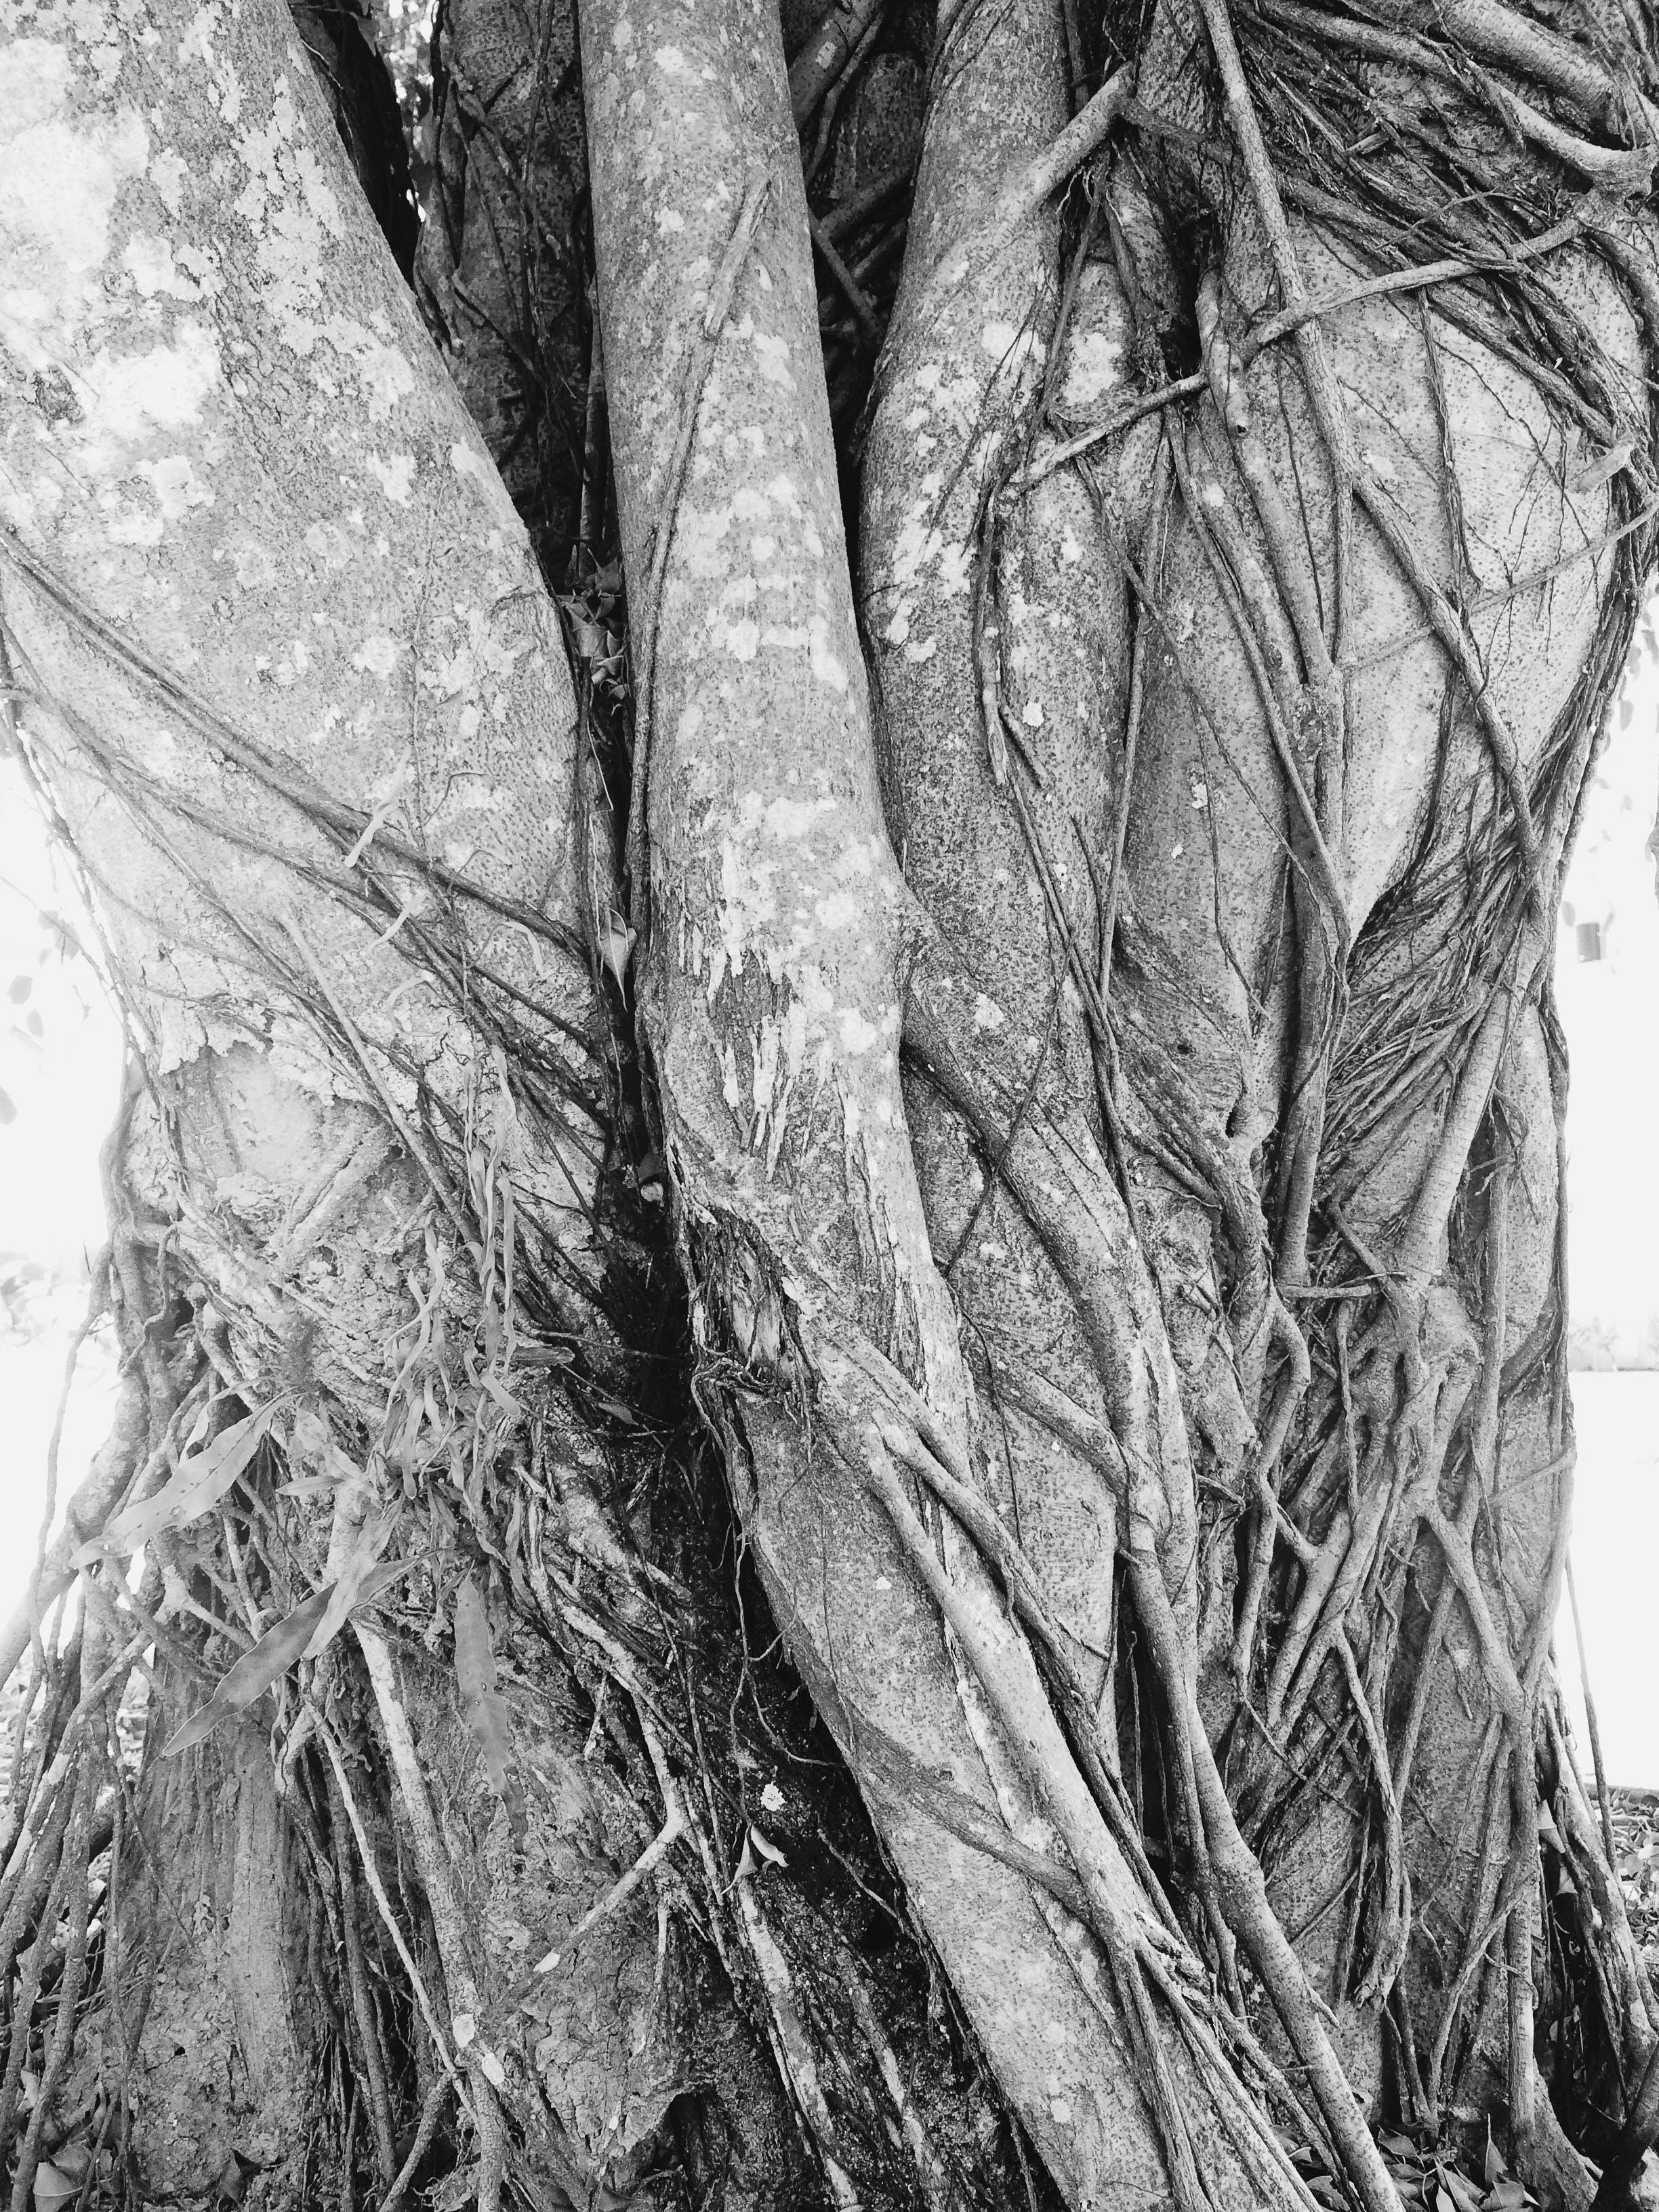 Free stock photo of tree, tree trunk, trunk